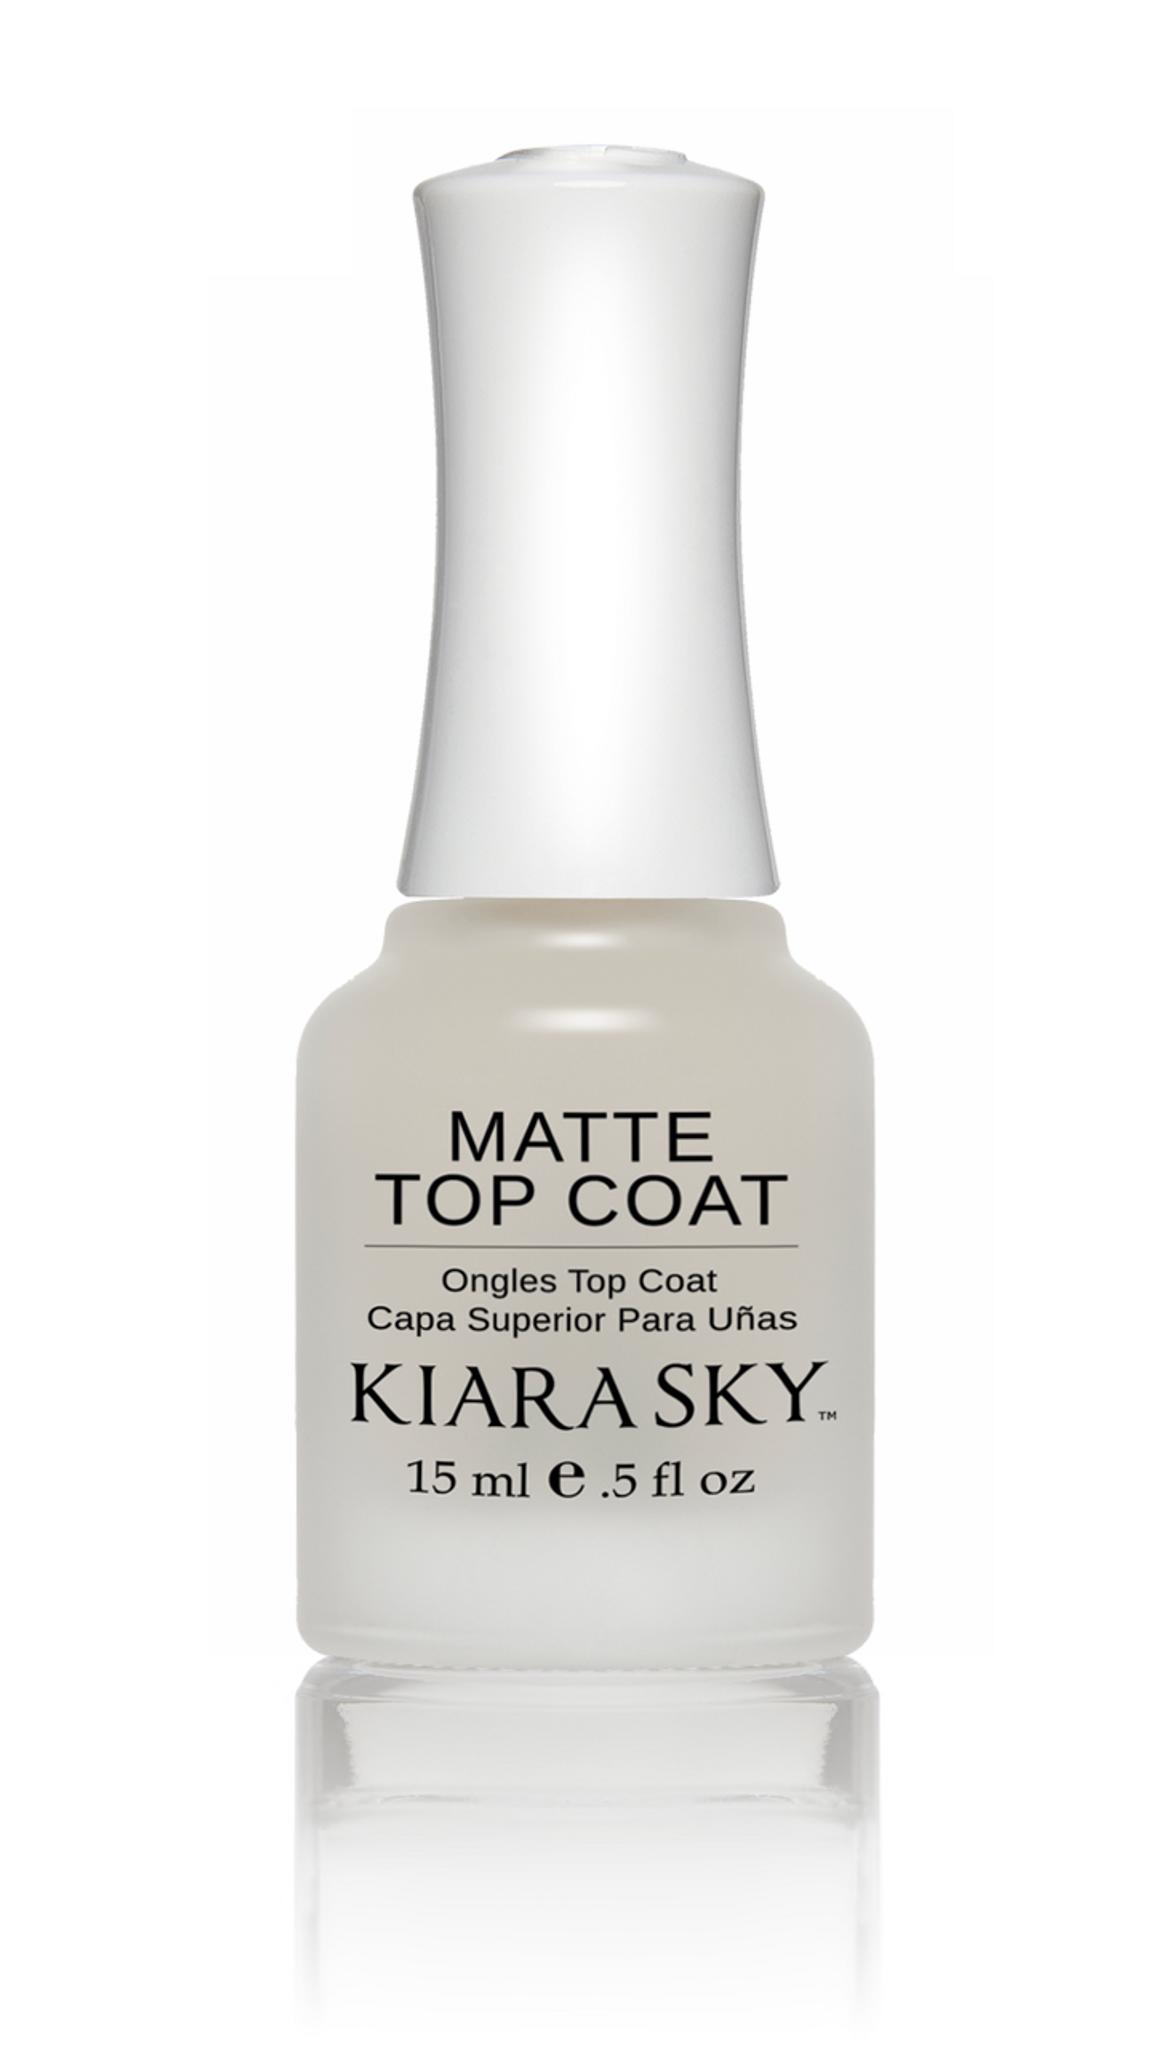 Matte Top Coat | Best Matte Top Coat | Kiara Sky